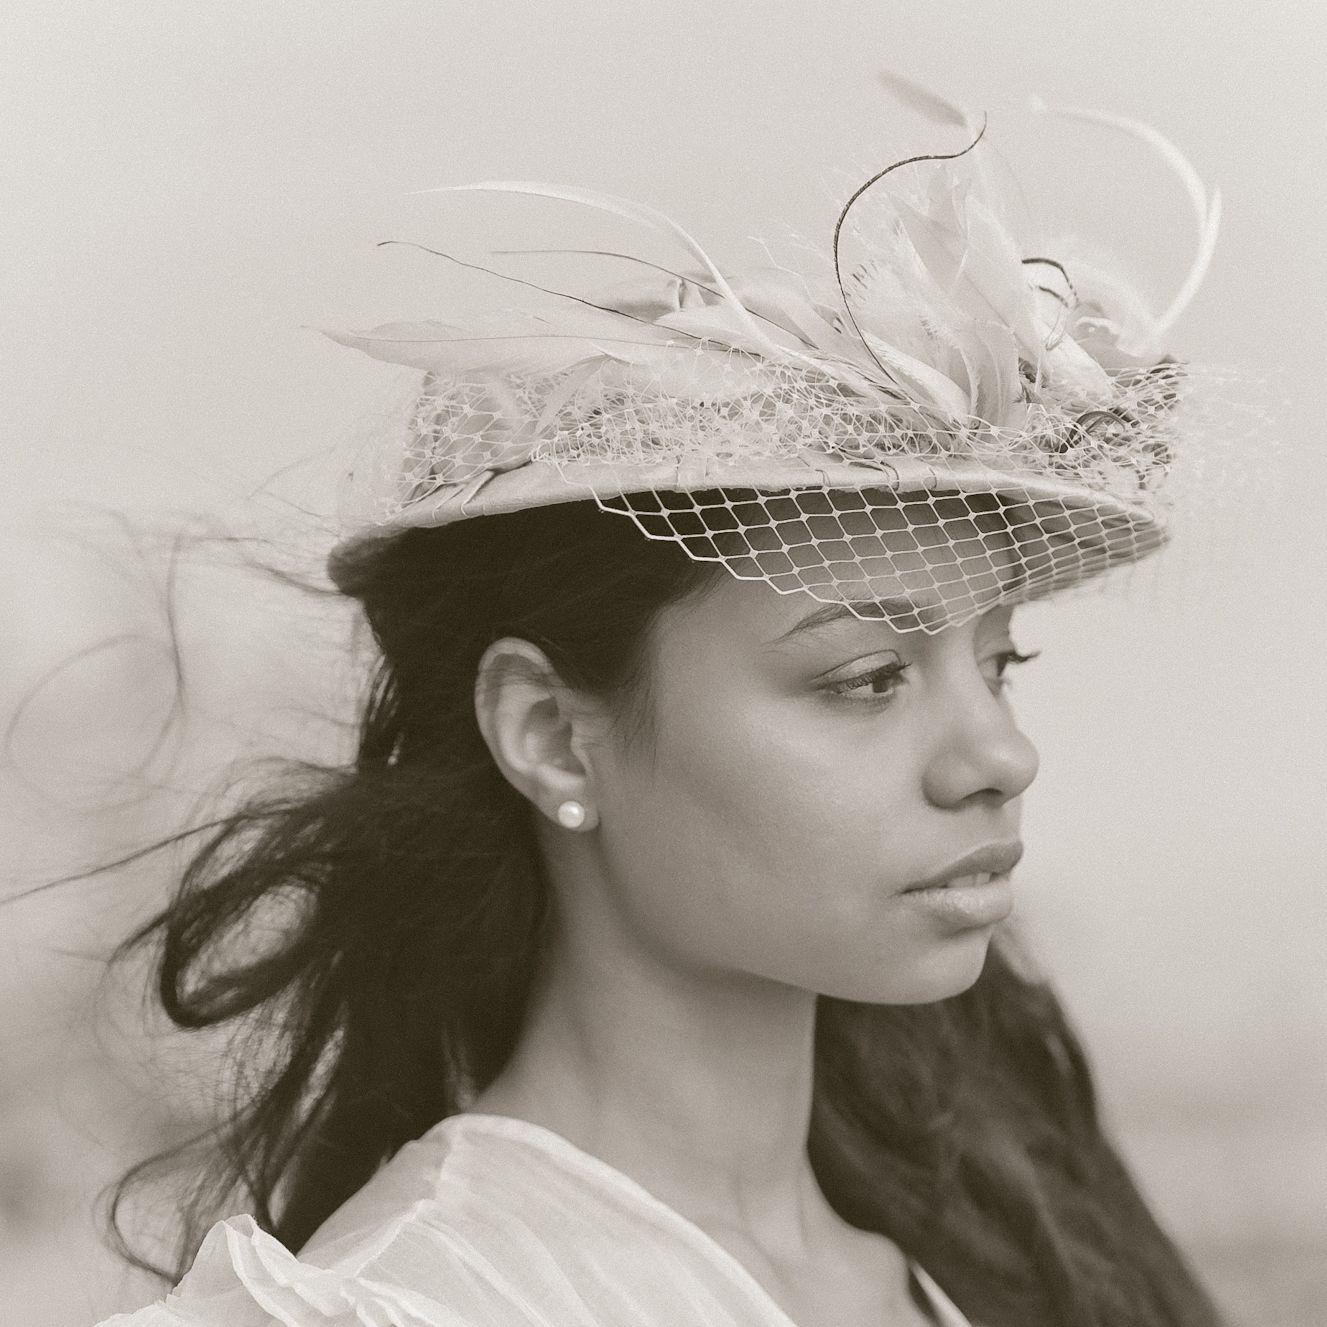 Veil Inspiration Bridal Hats Photographed By Melinda Kelley Photography On Erica Elizabeth Designs